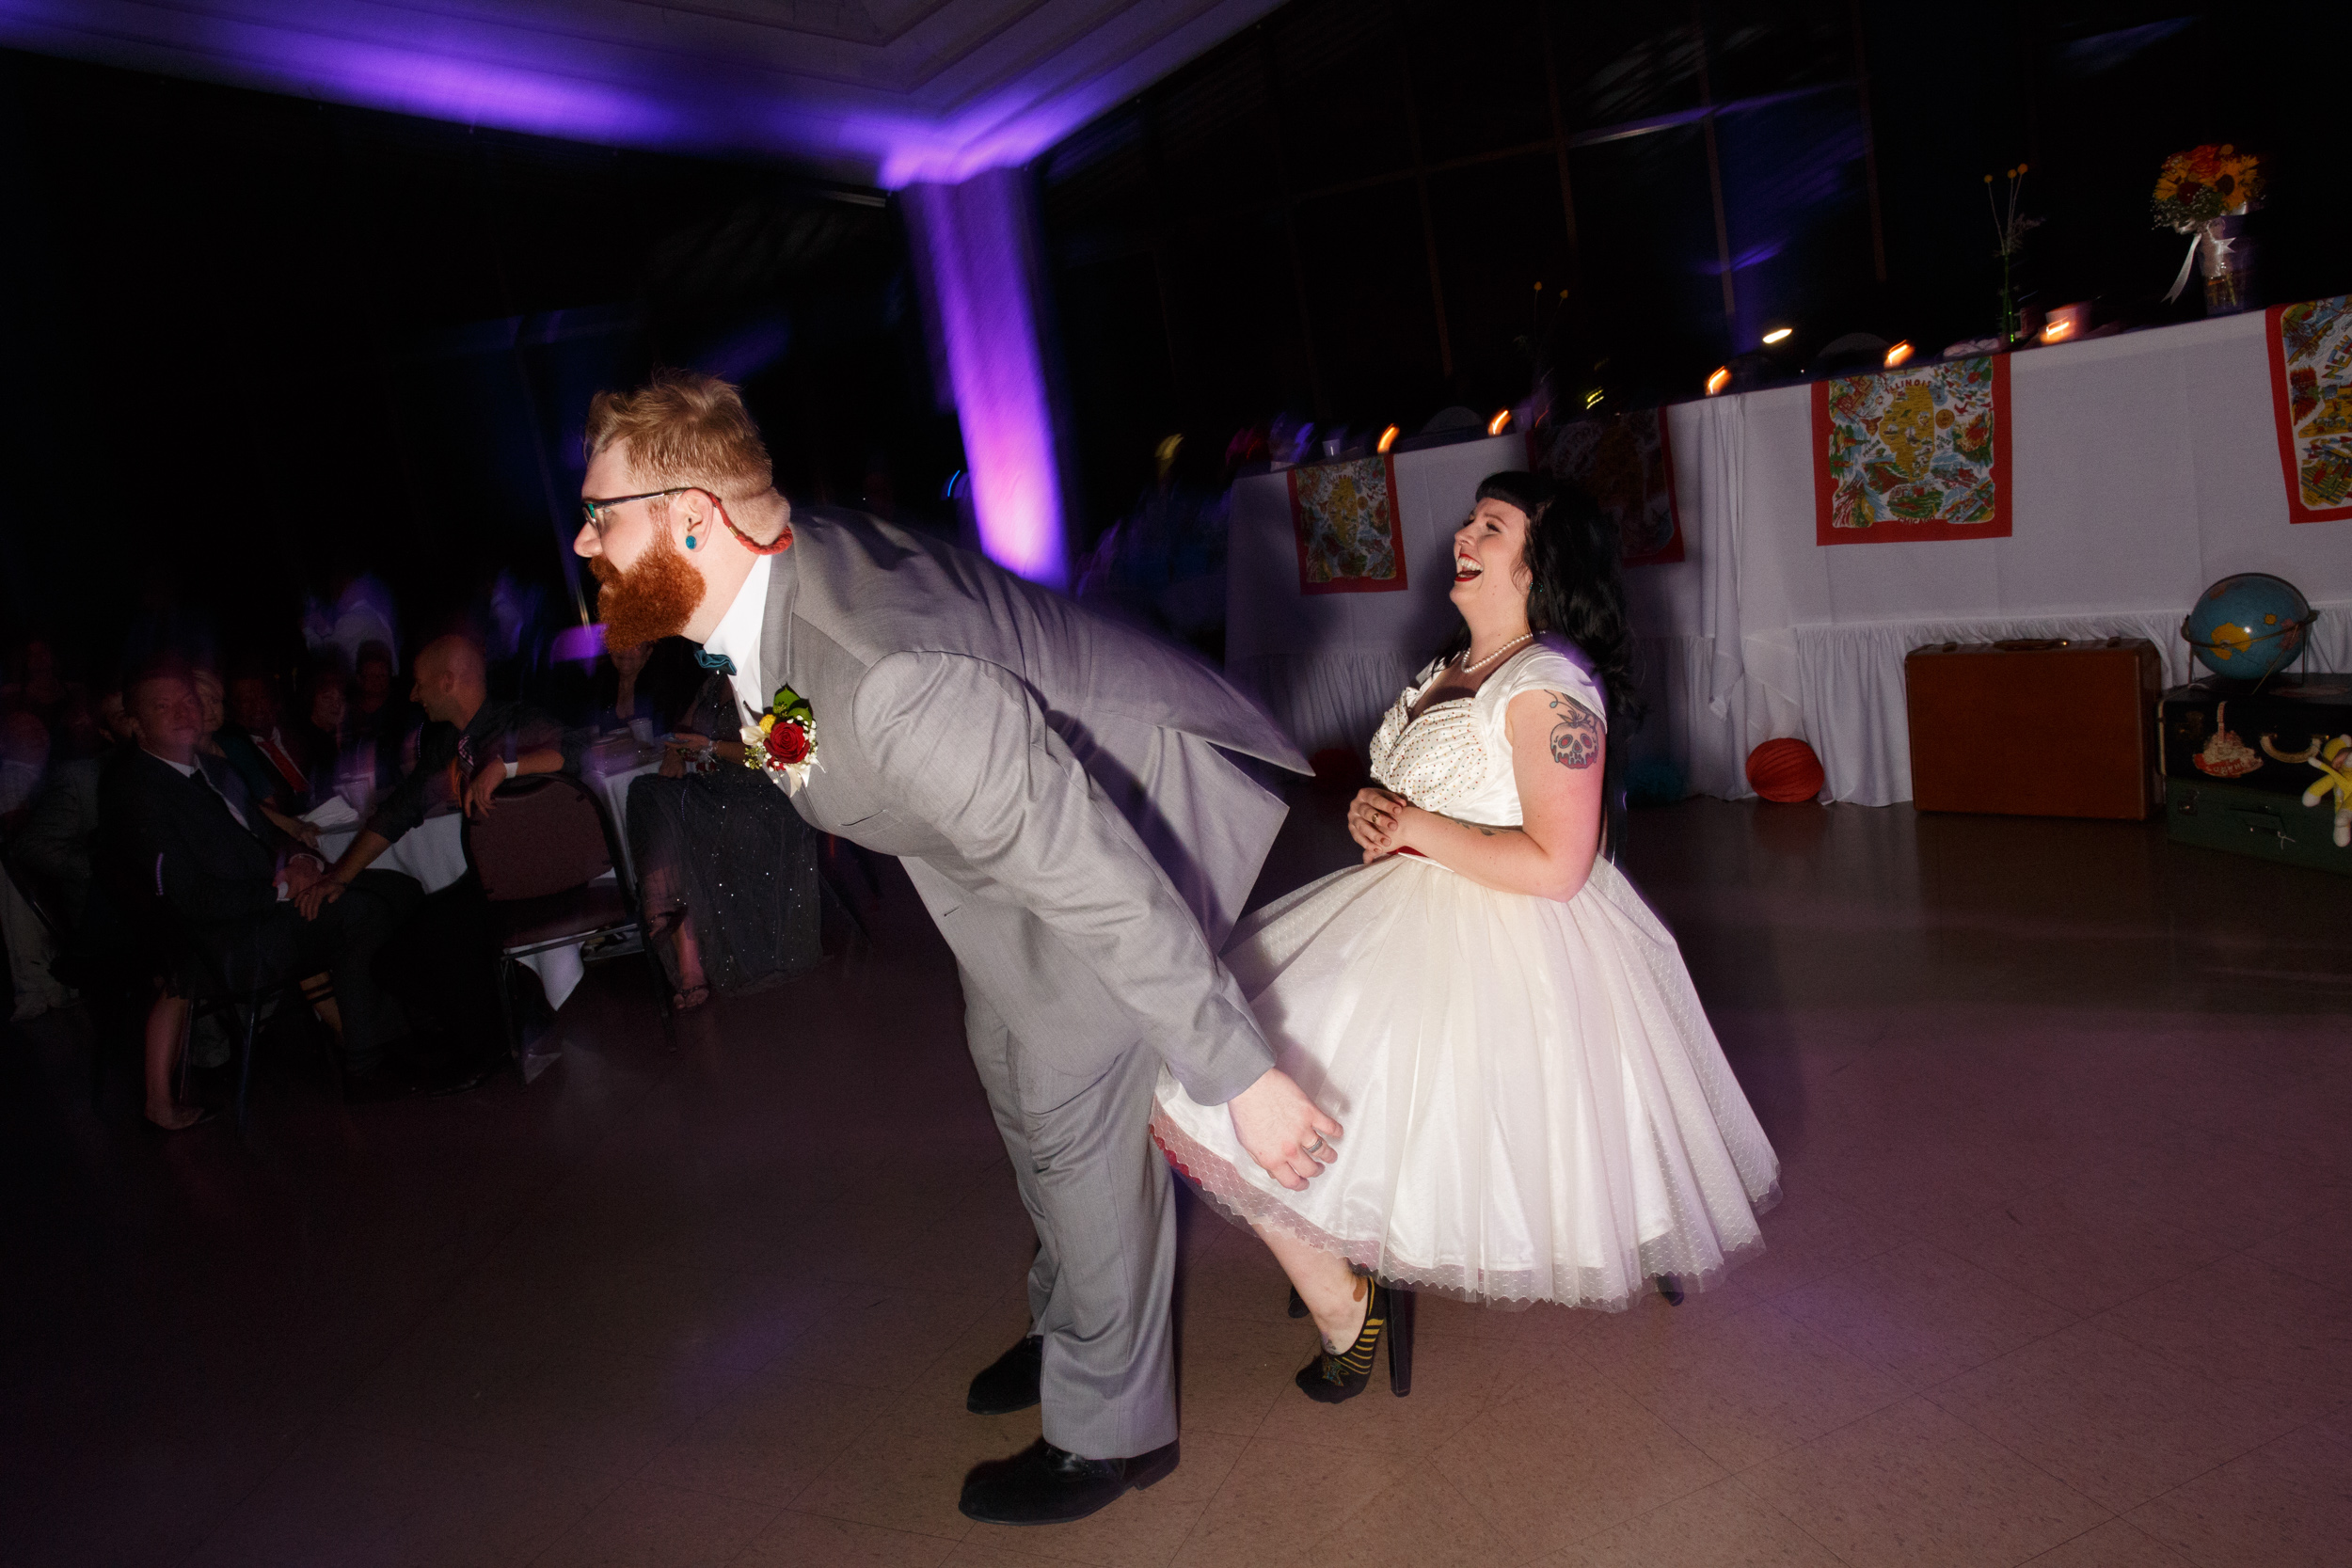 Christian & Sarah wedding photography by Brian milo-275.jpg